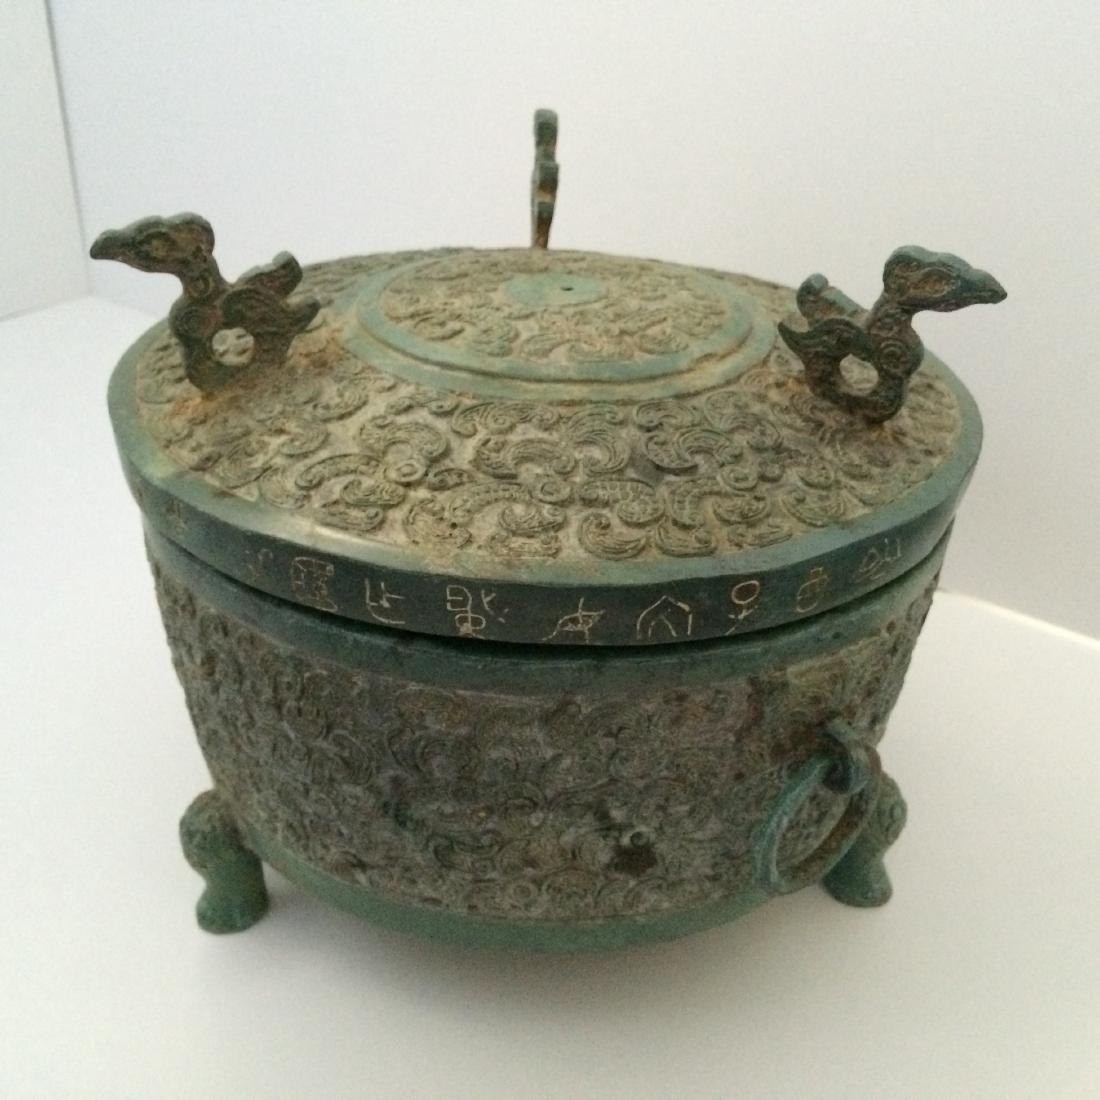 "Engraved Chinese Antique Bronze Censer (9.5""Dia)"